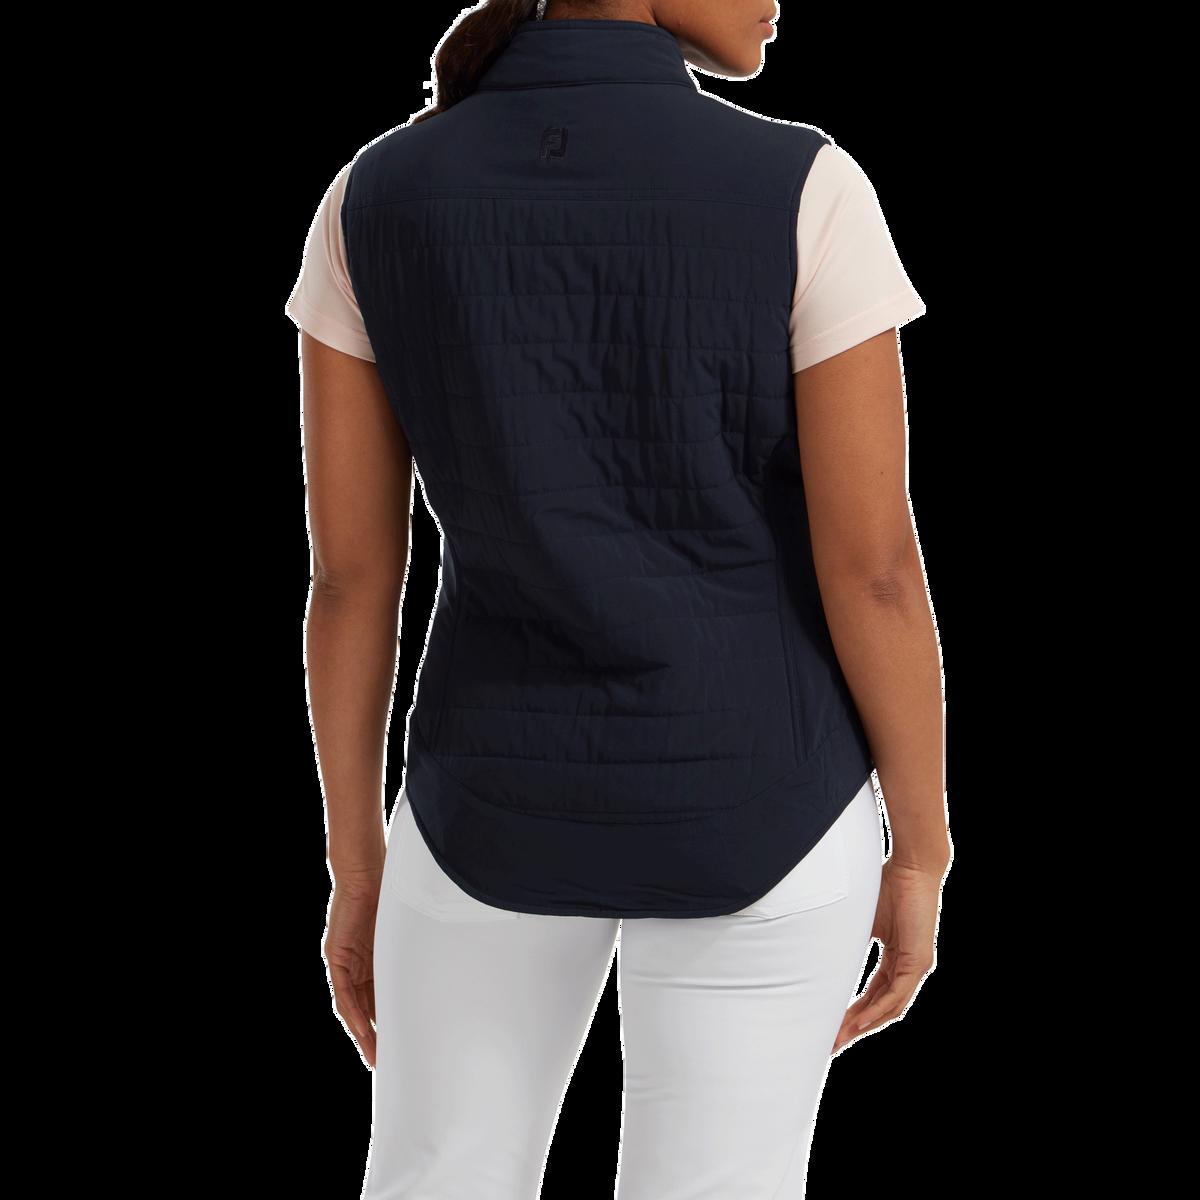 Women's Insulated Vest